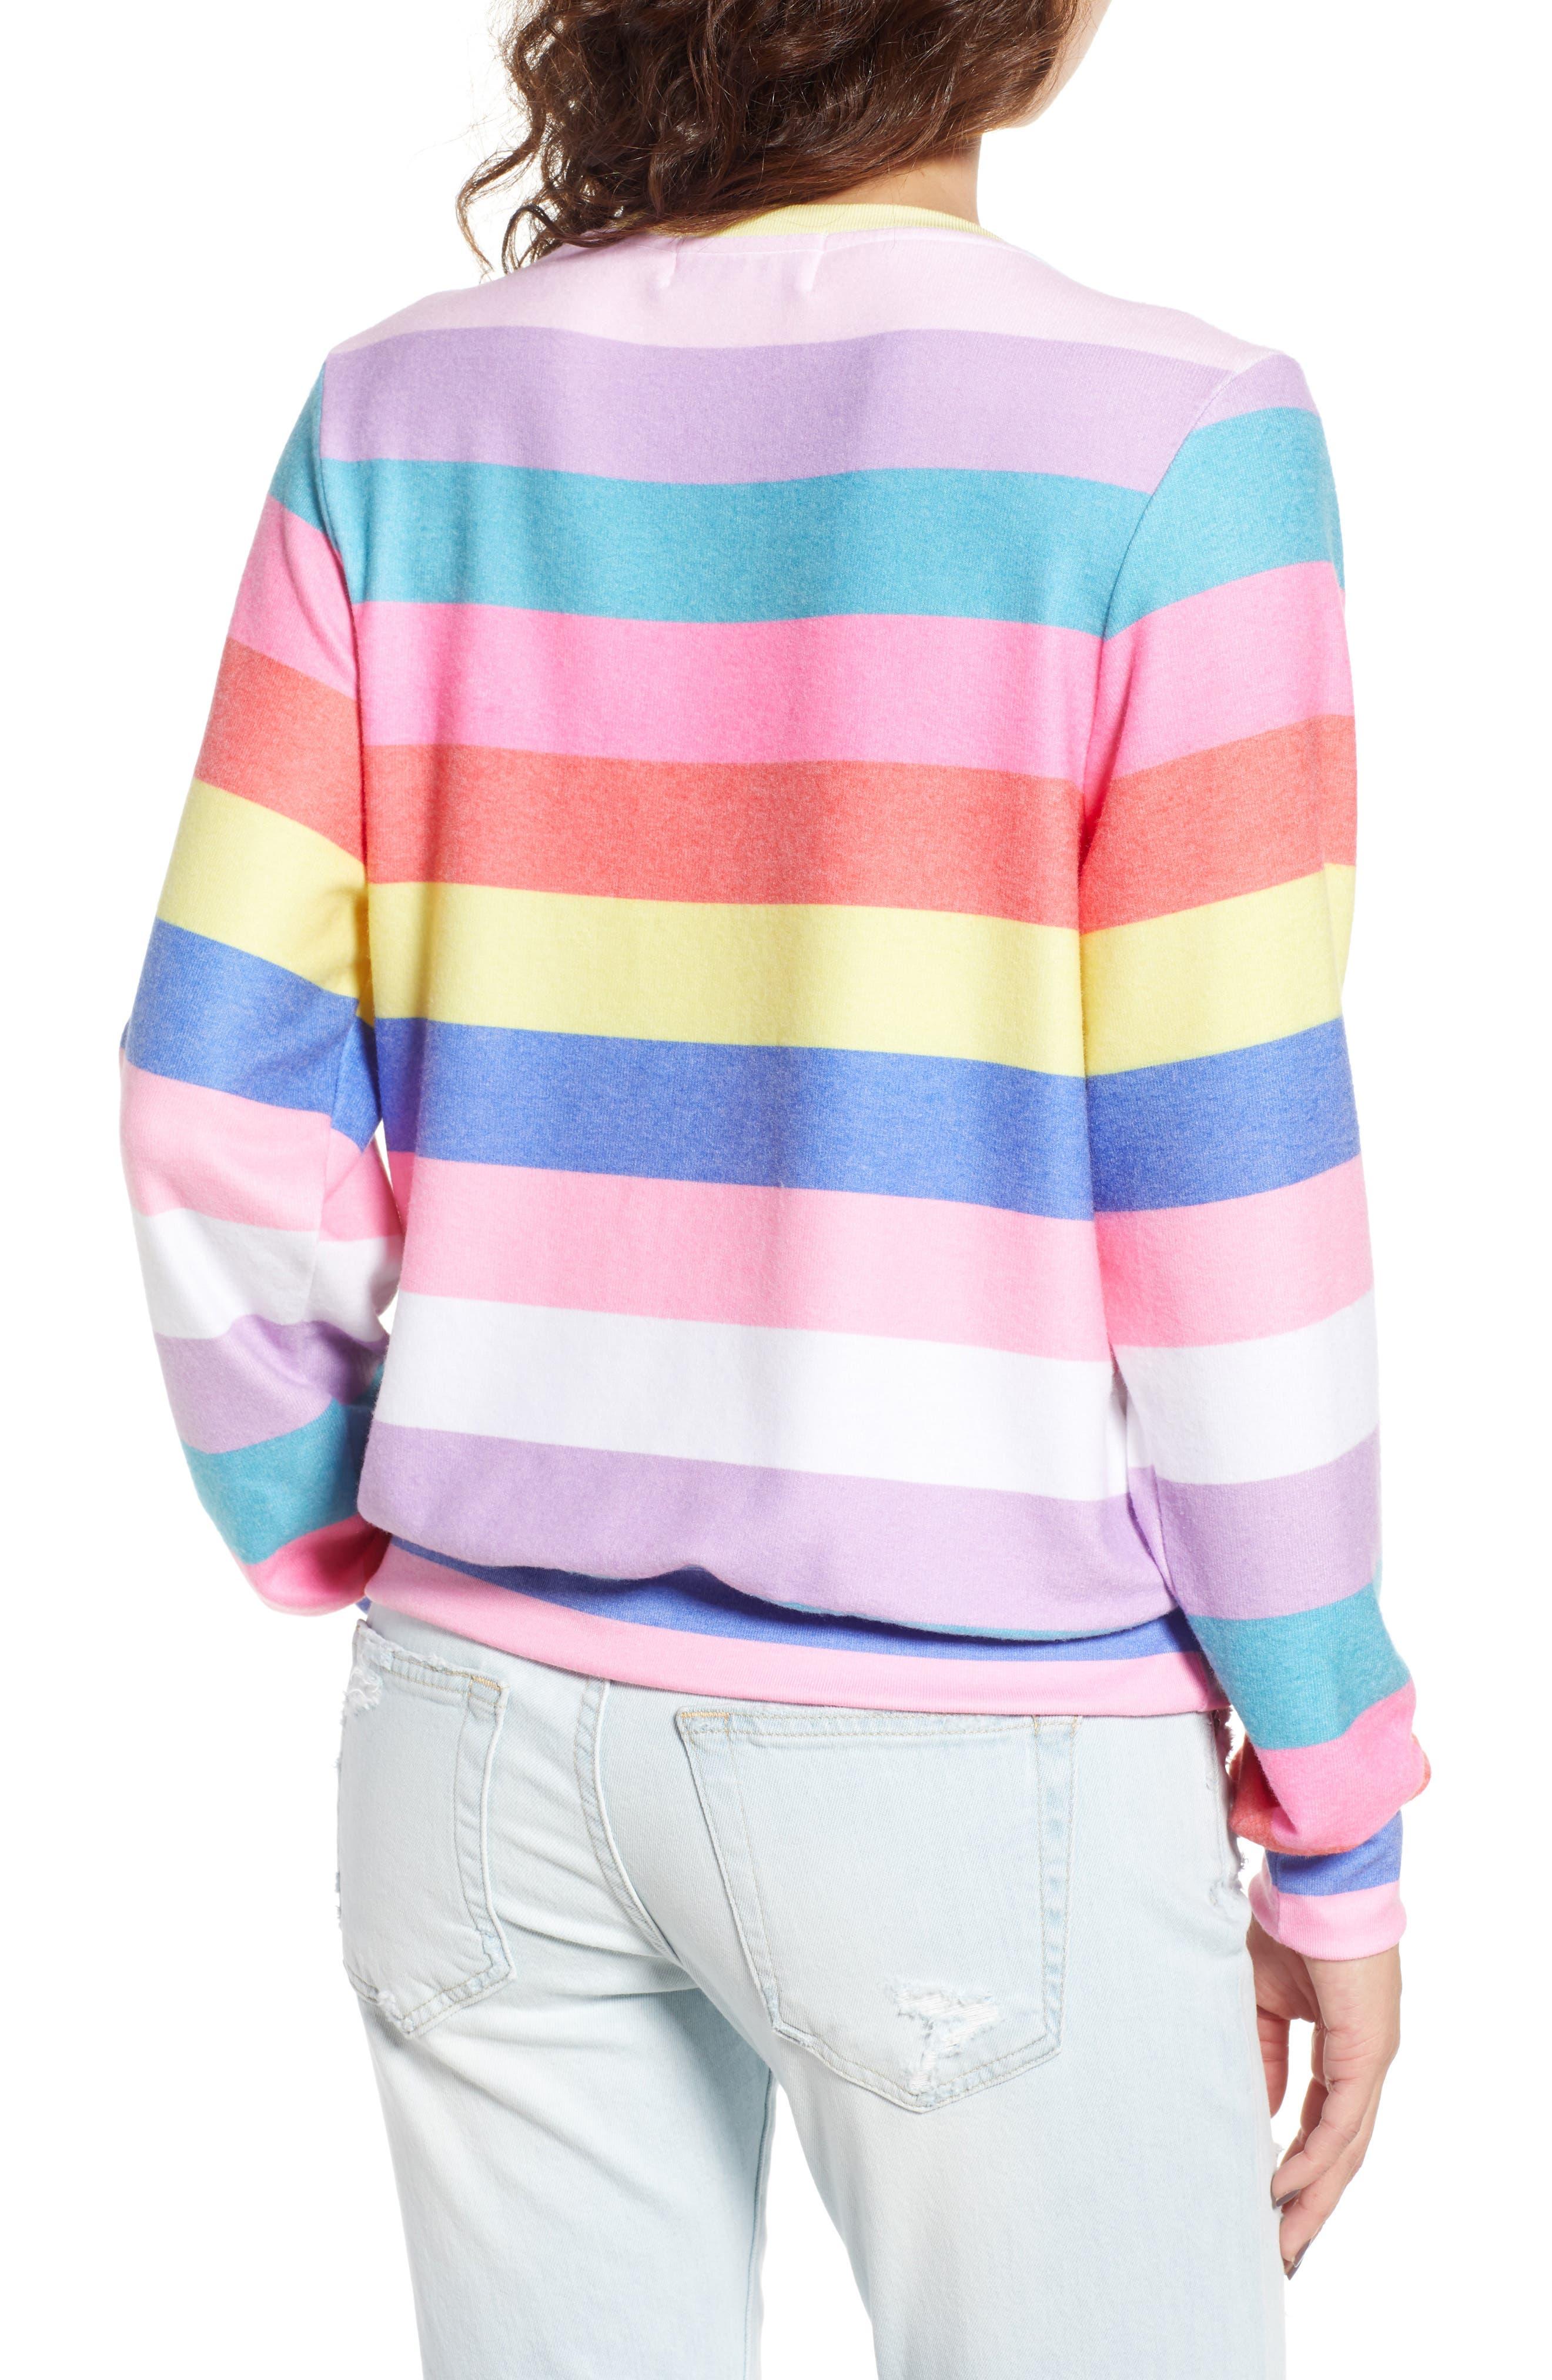 Castaway Roadtrip Sweatshirt,                             Alternate thumbnail 2, color,                             650